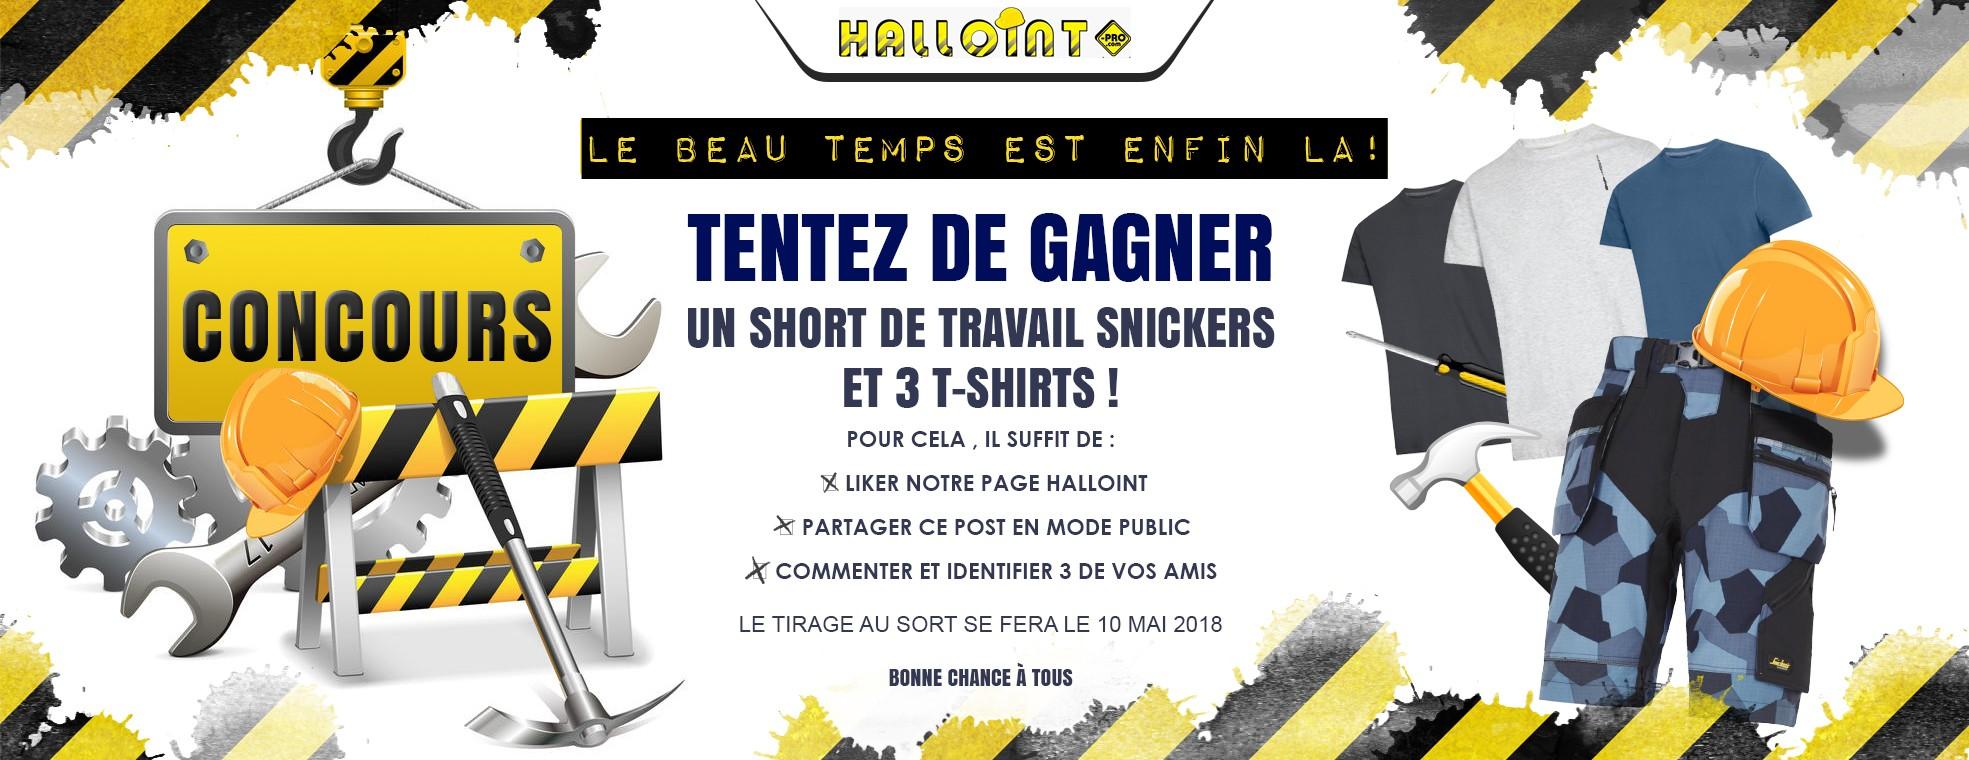 Halloint_banner_Concours[329153]